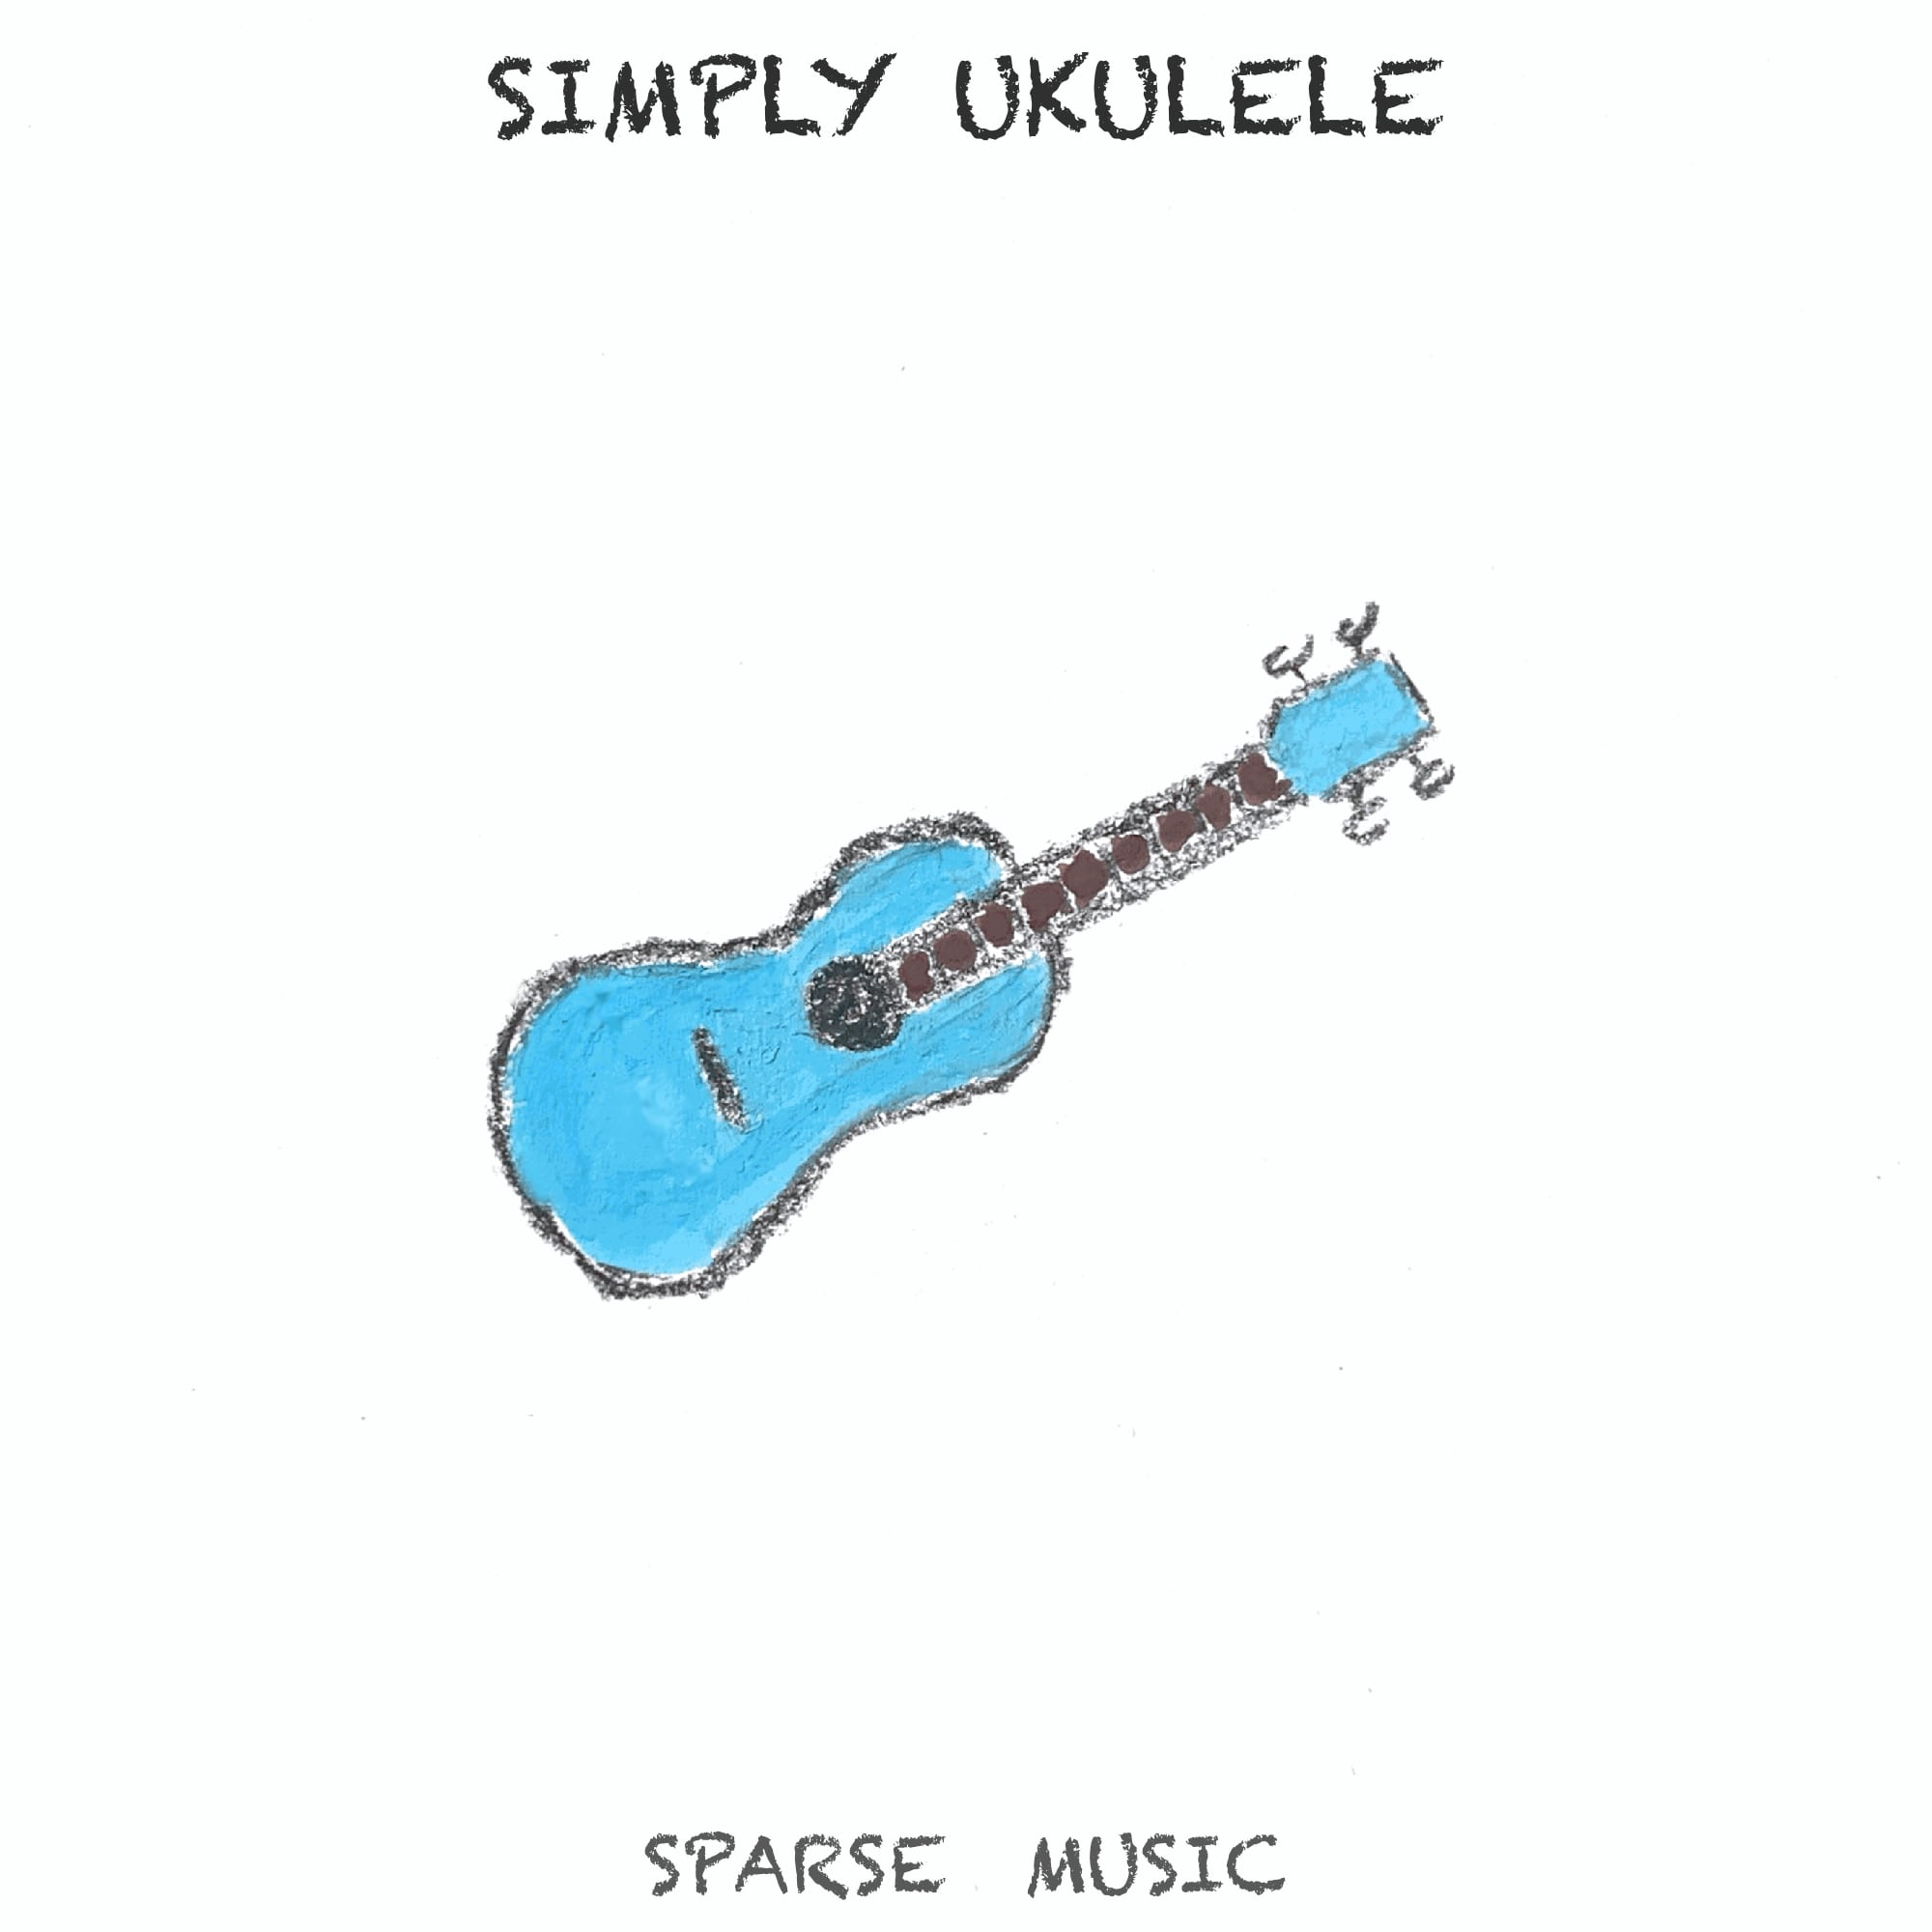 SPRS 01072 Simply Ukulele 2000